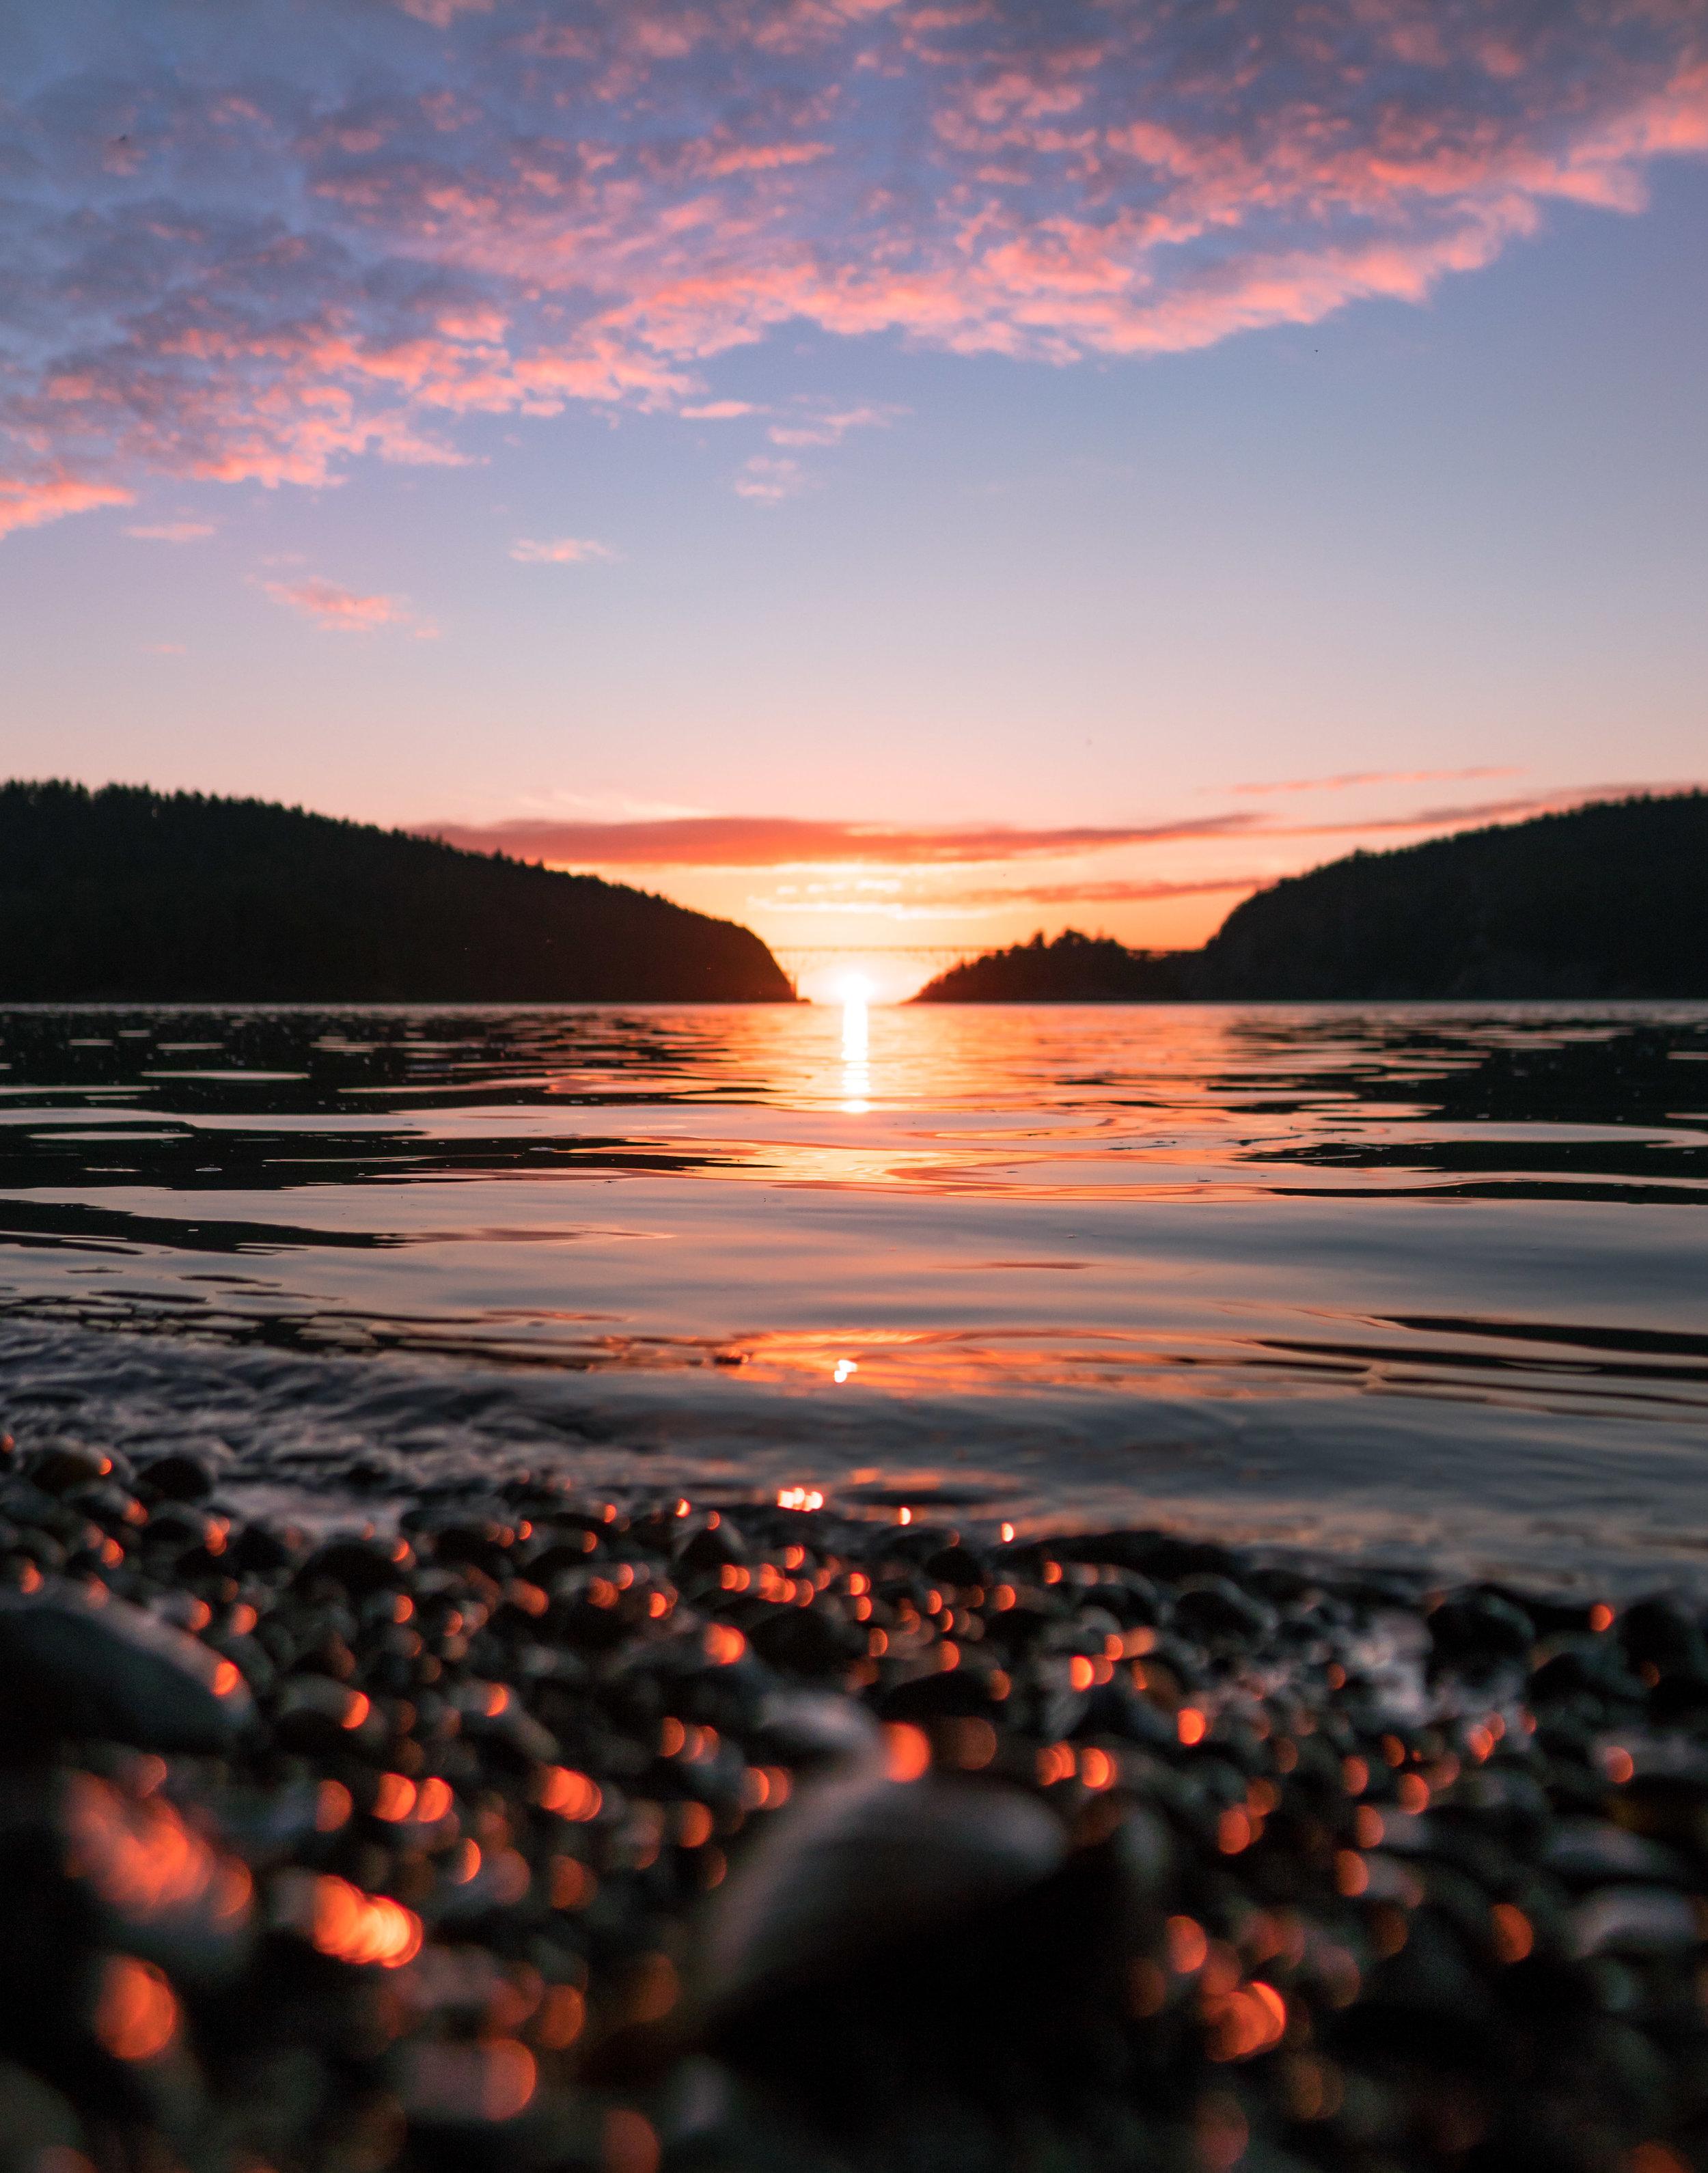 Sunset at Deception Pass